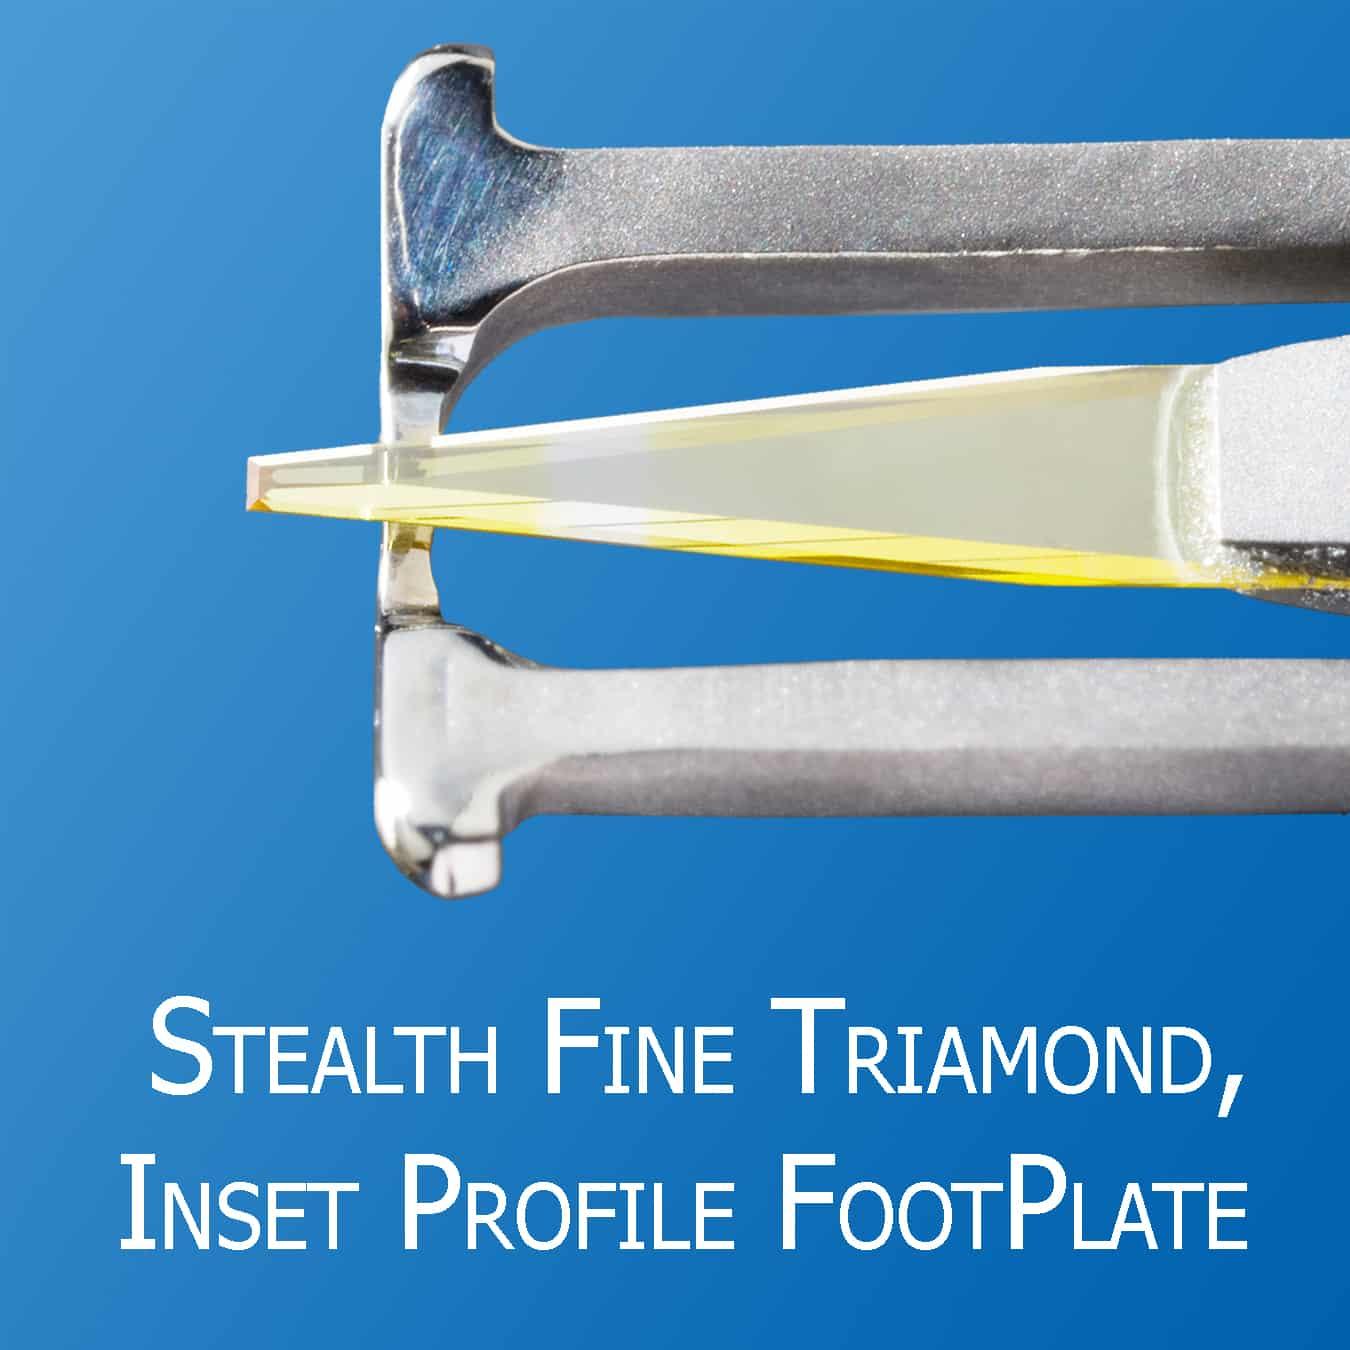 Fine Triamond, Elite II Micrometer